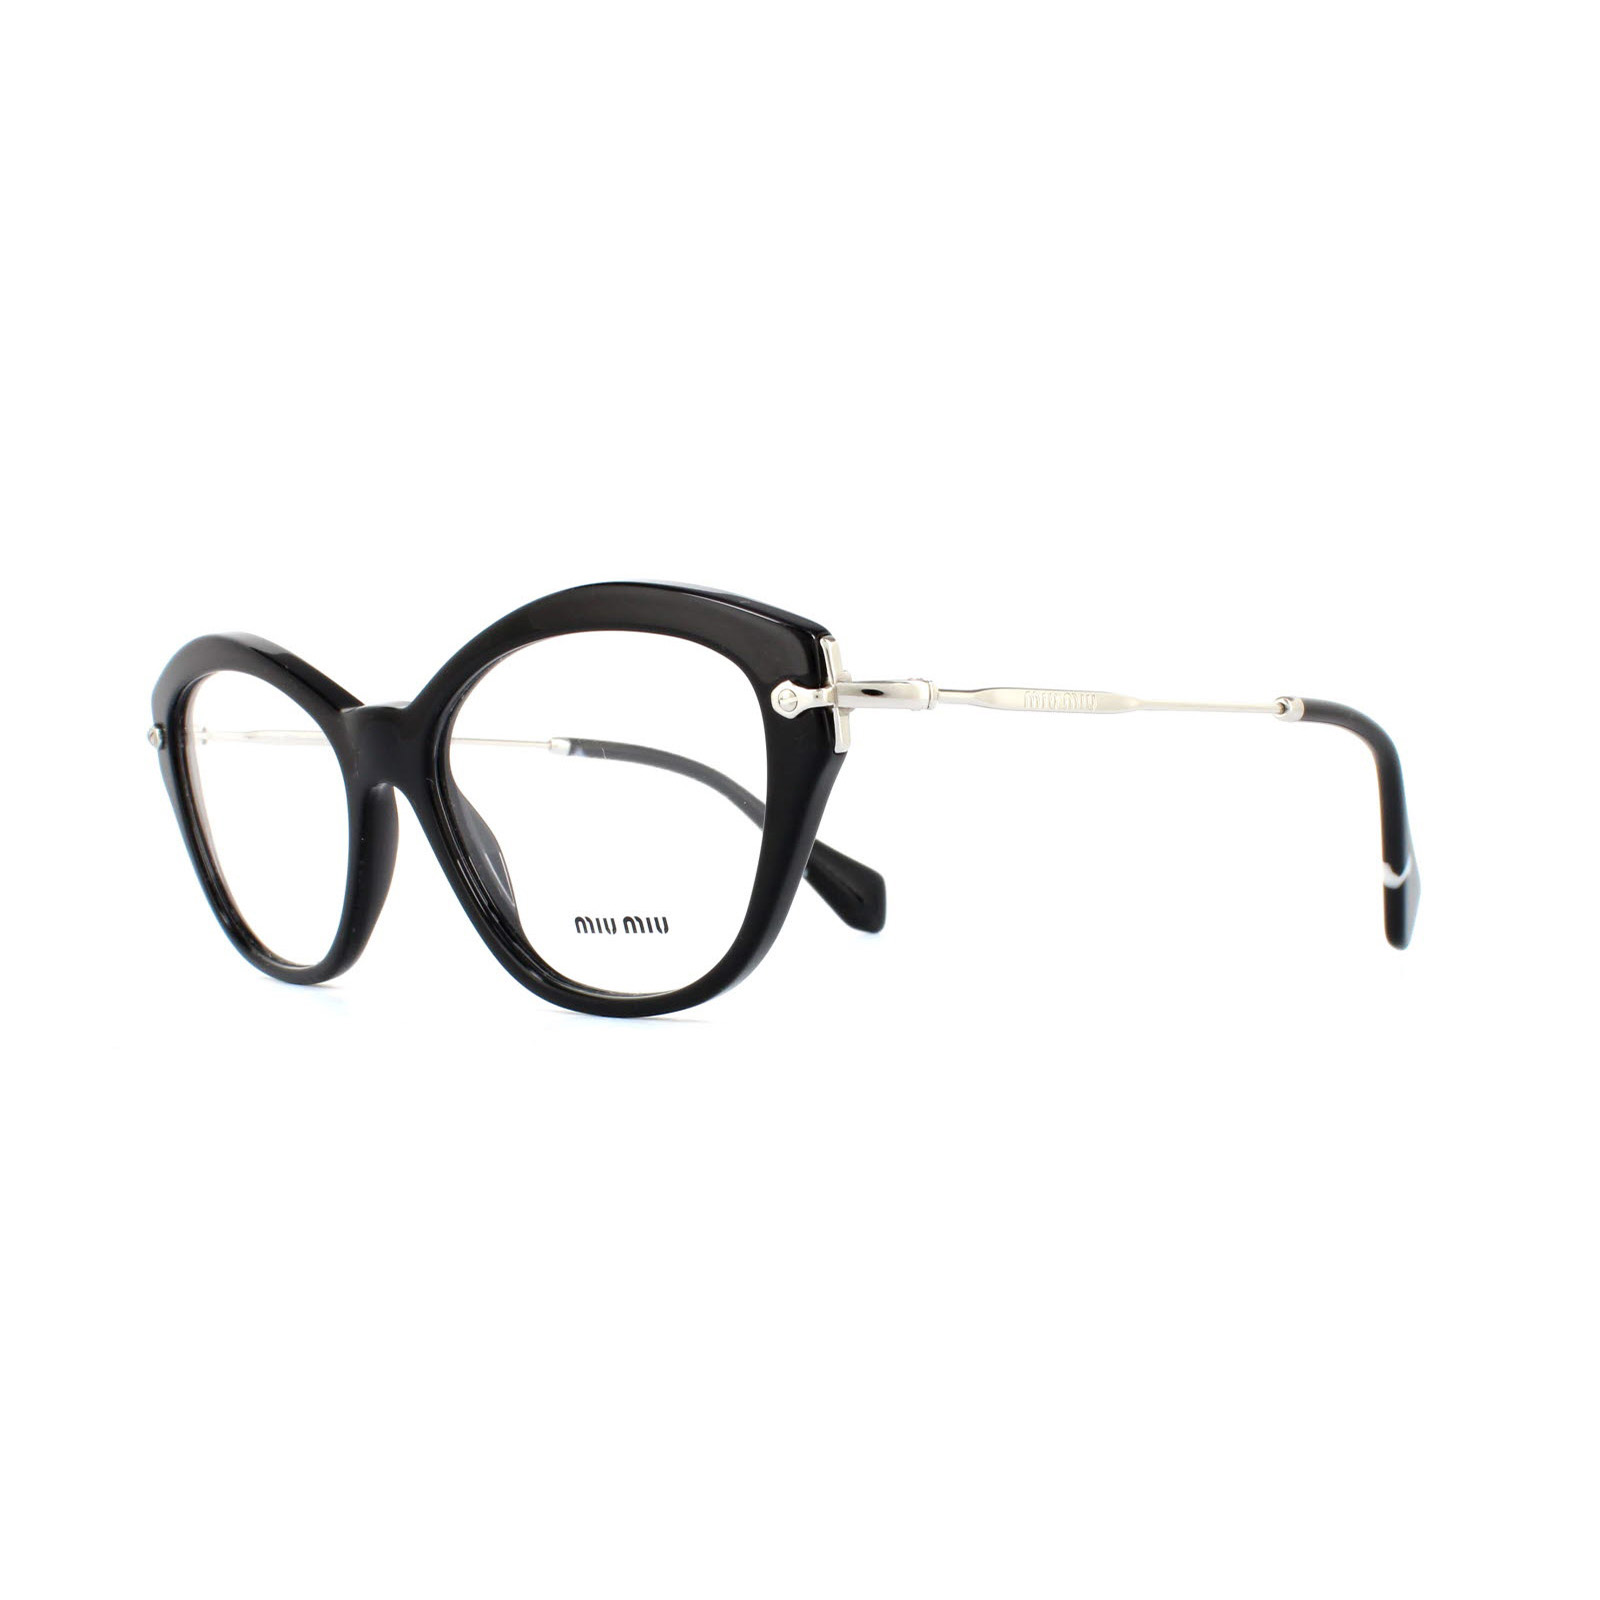 3511eb50baecc Cheap Miu Miu 02OV Glasses Frames - Discounted Sunglasses